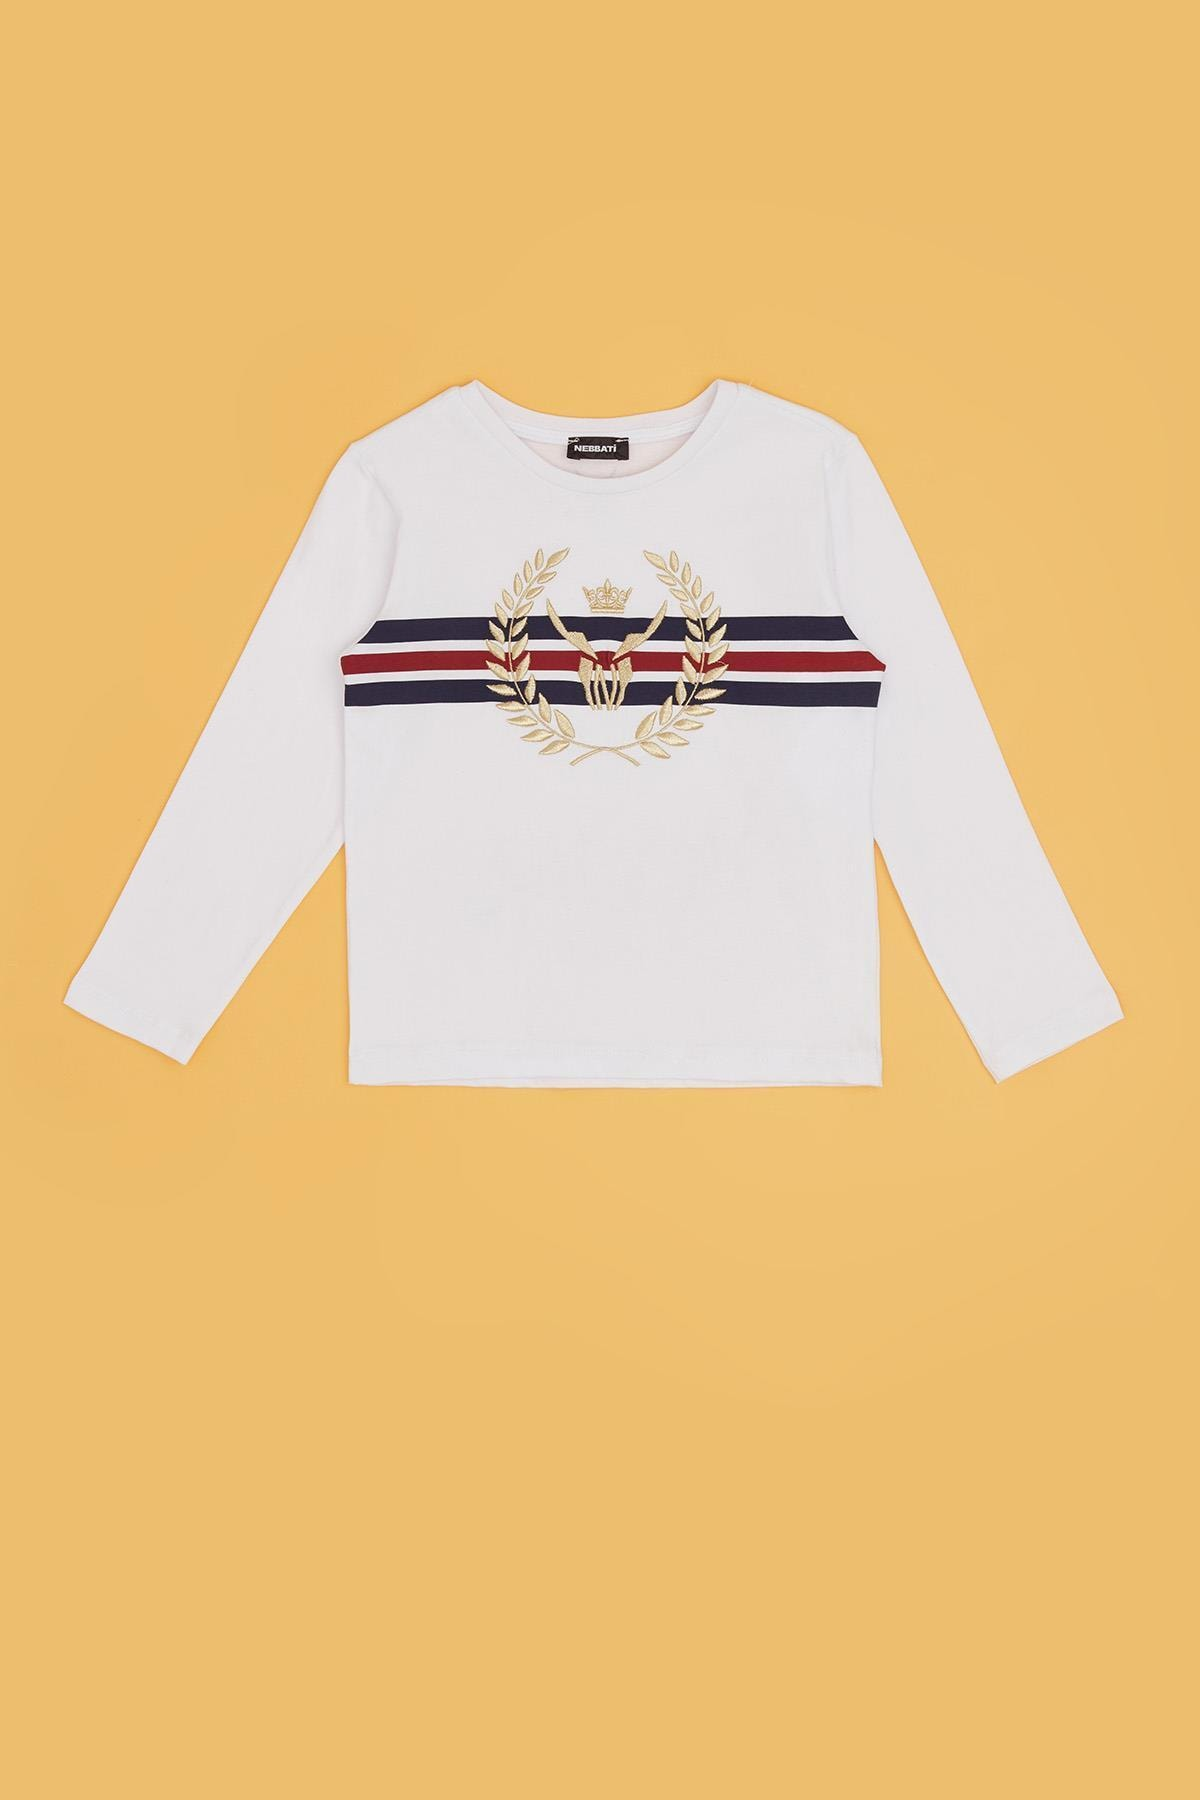 Nebbati Erkek Çocuk Beyaz T-shirt 20fw0nb3514 2